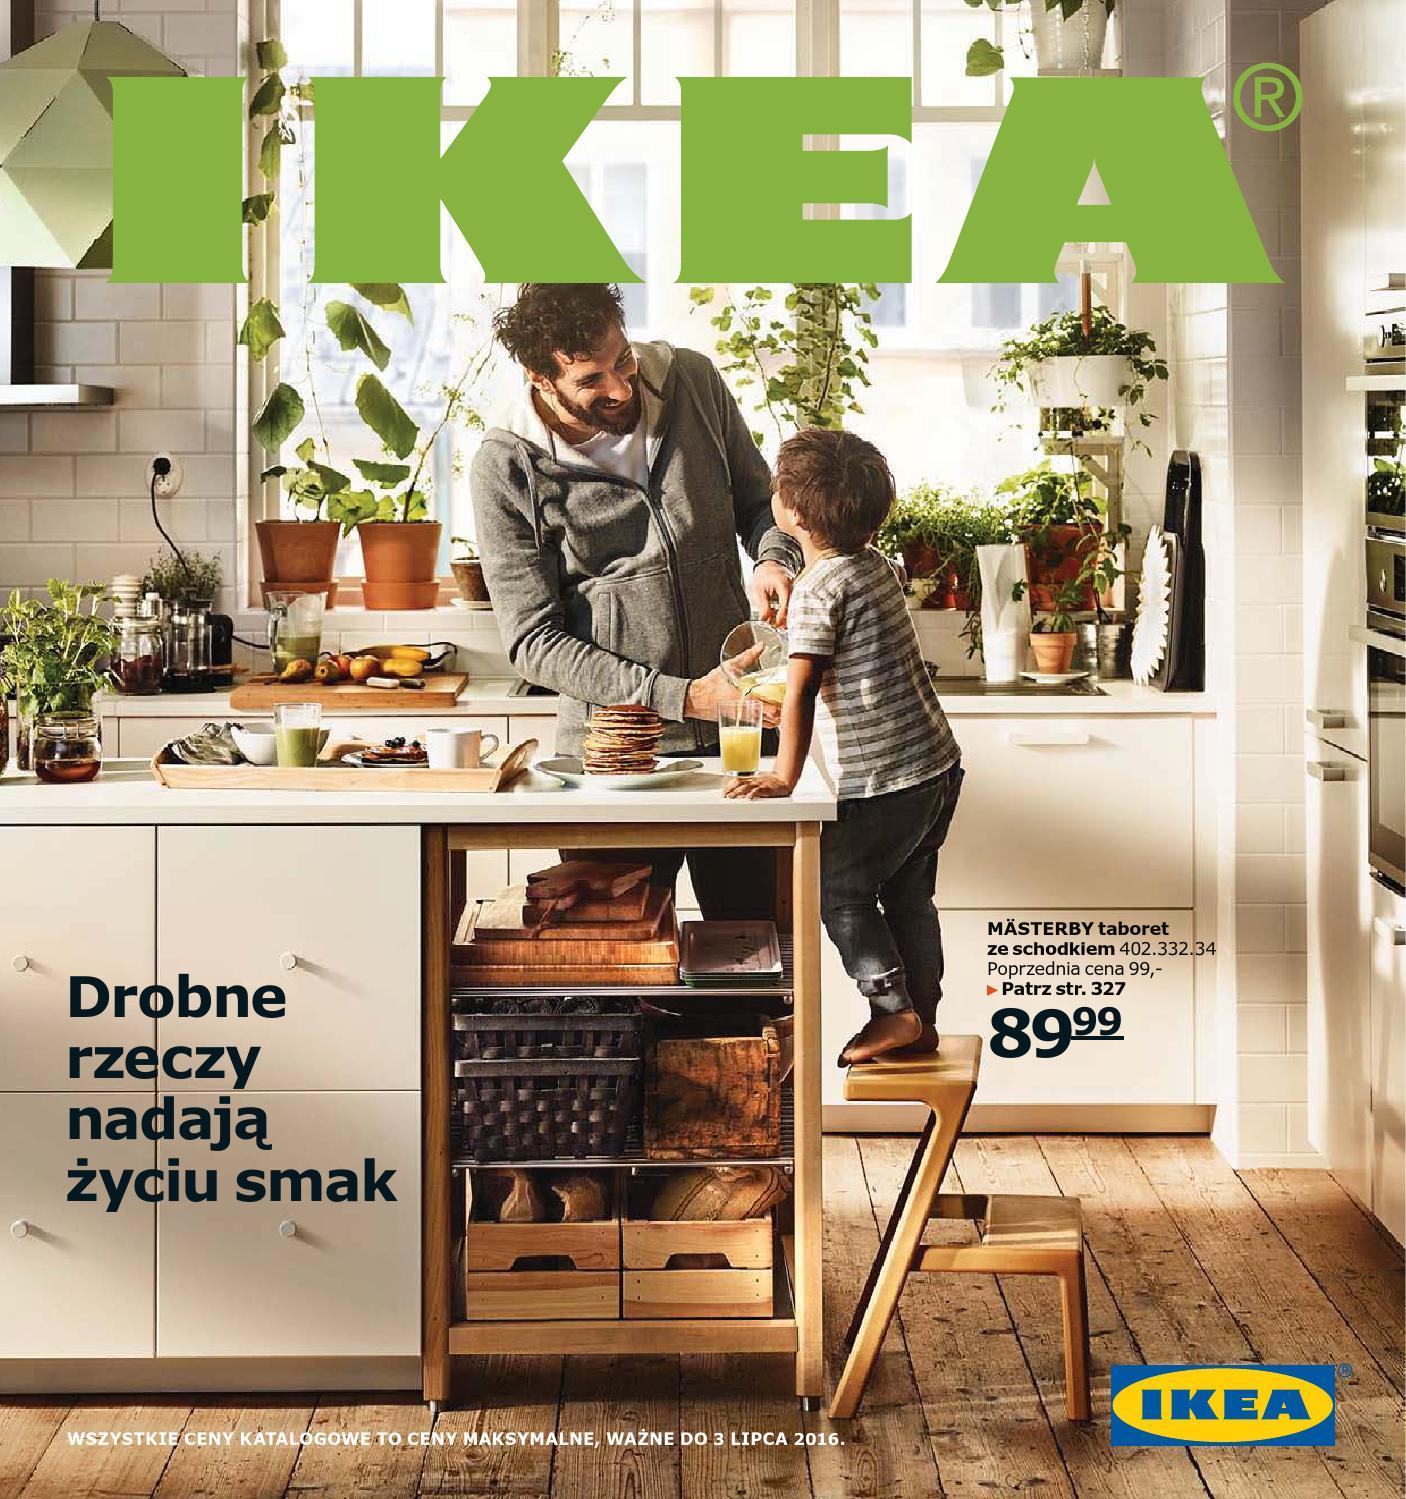 Ikea Katalog Ikea 2016 By Finmarket Issuu